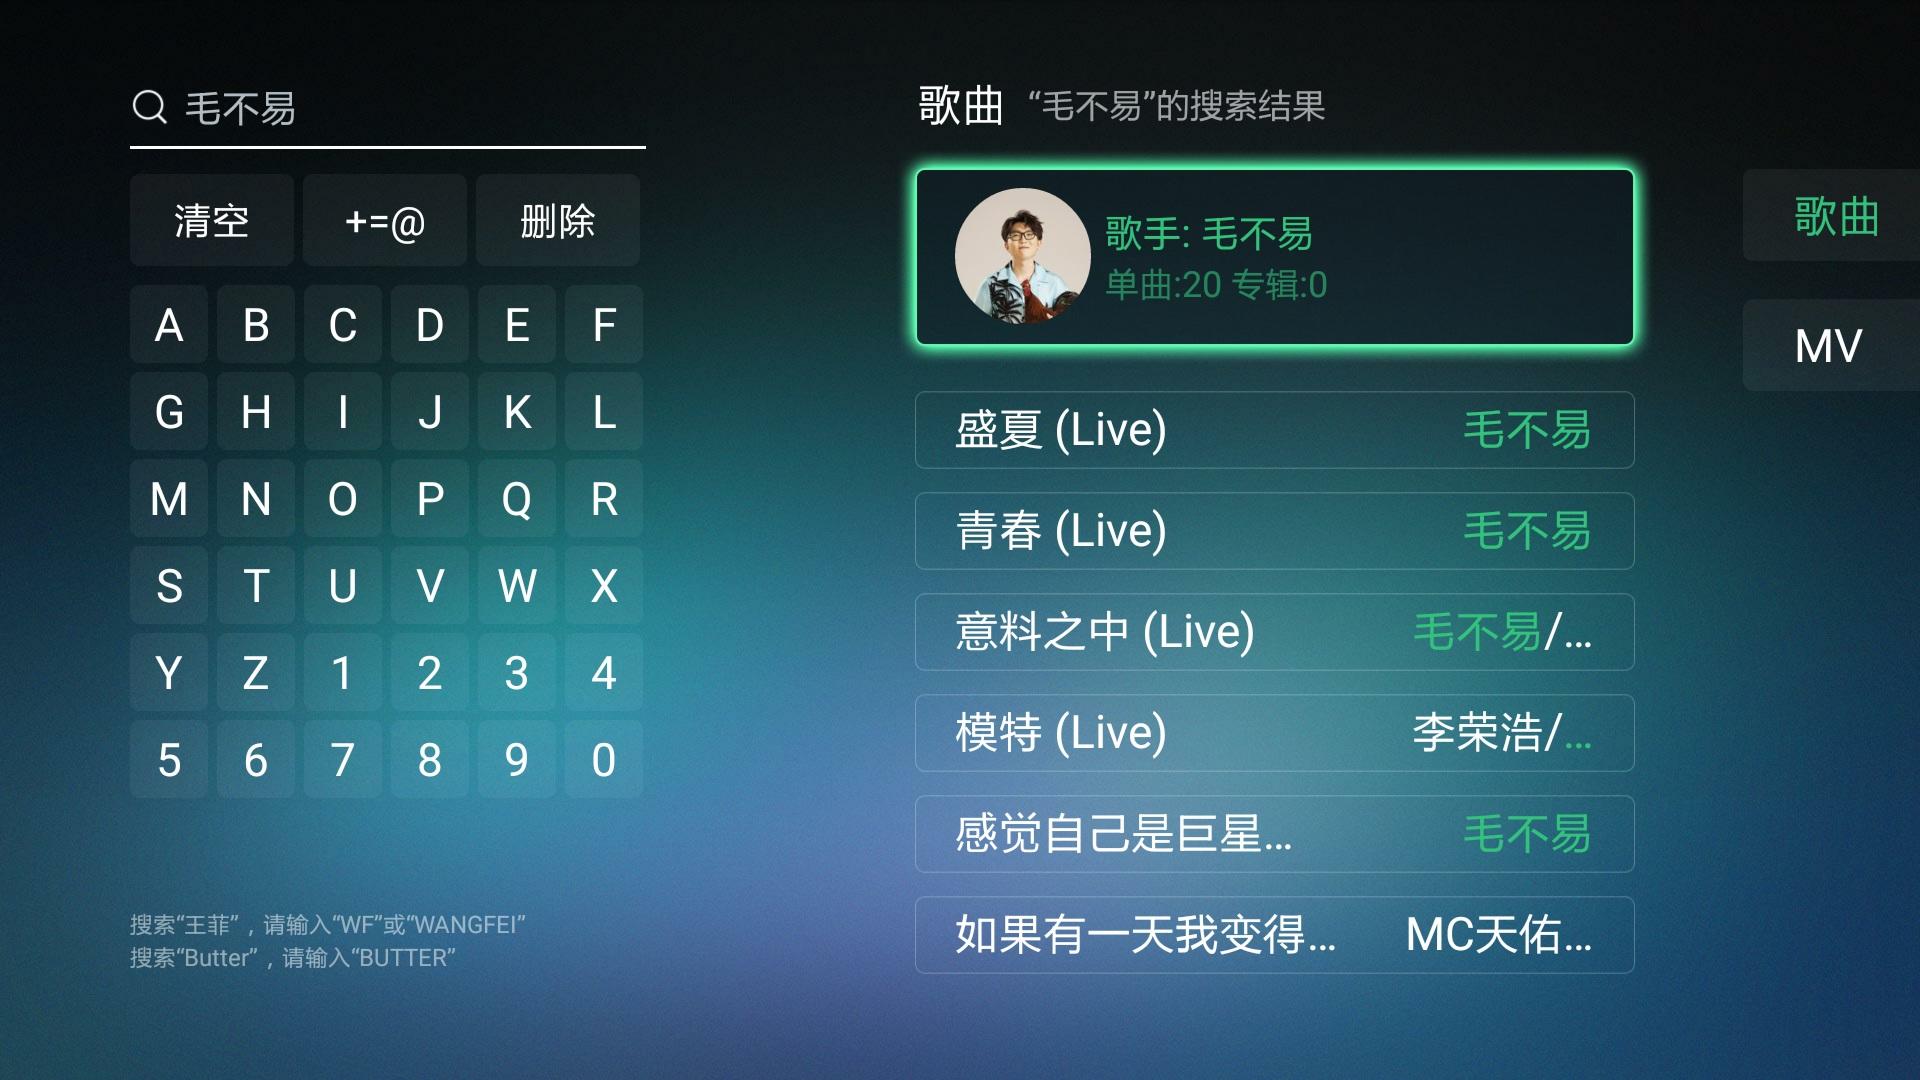 QQ音乐TV版截图